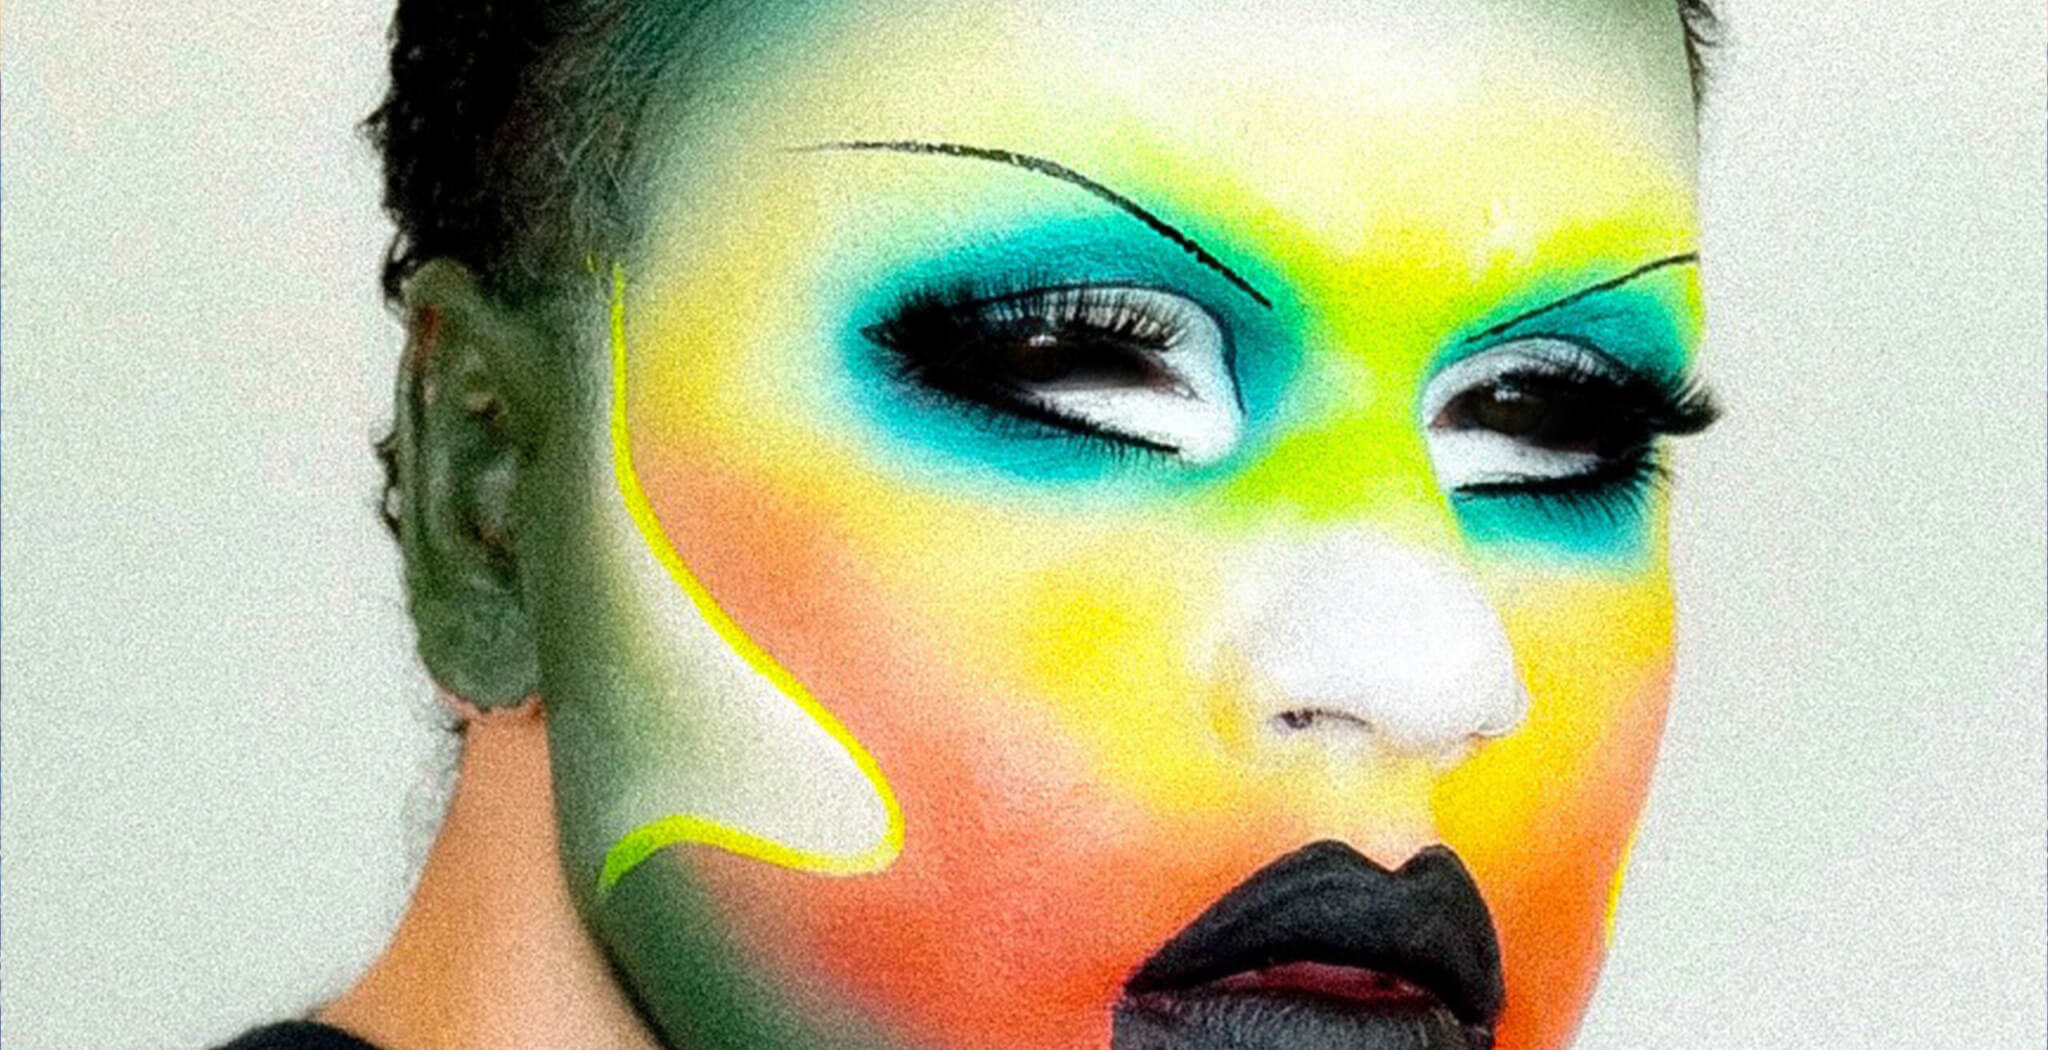 Glow Up Make-Up Artist in Rainbow look